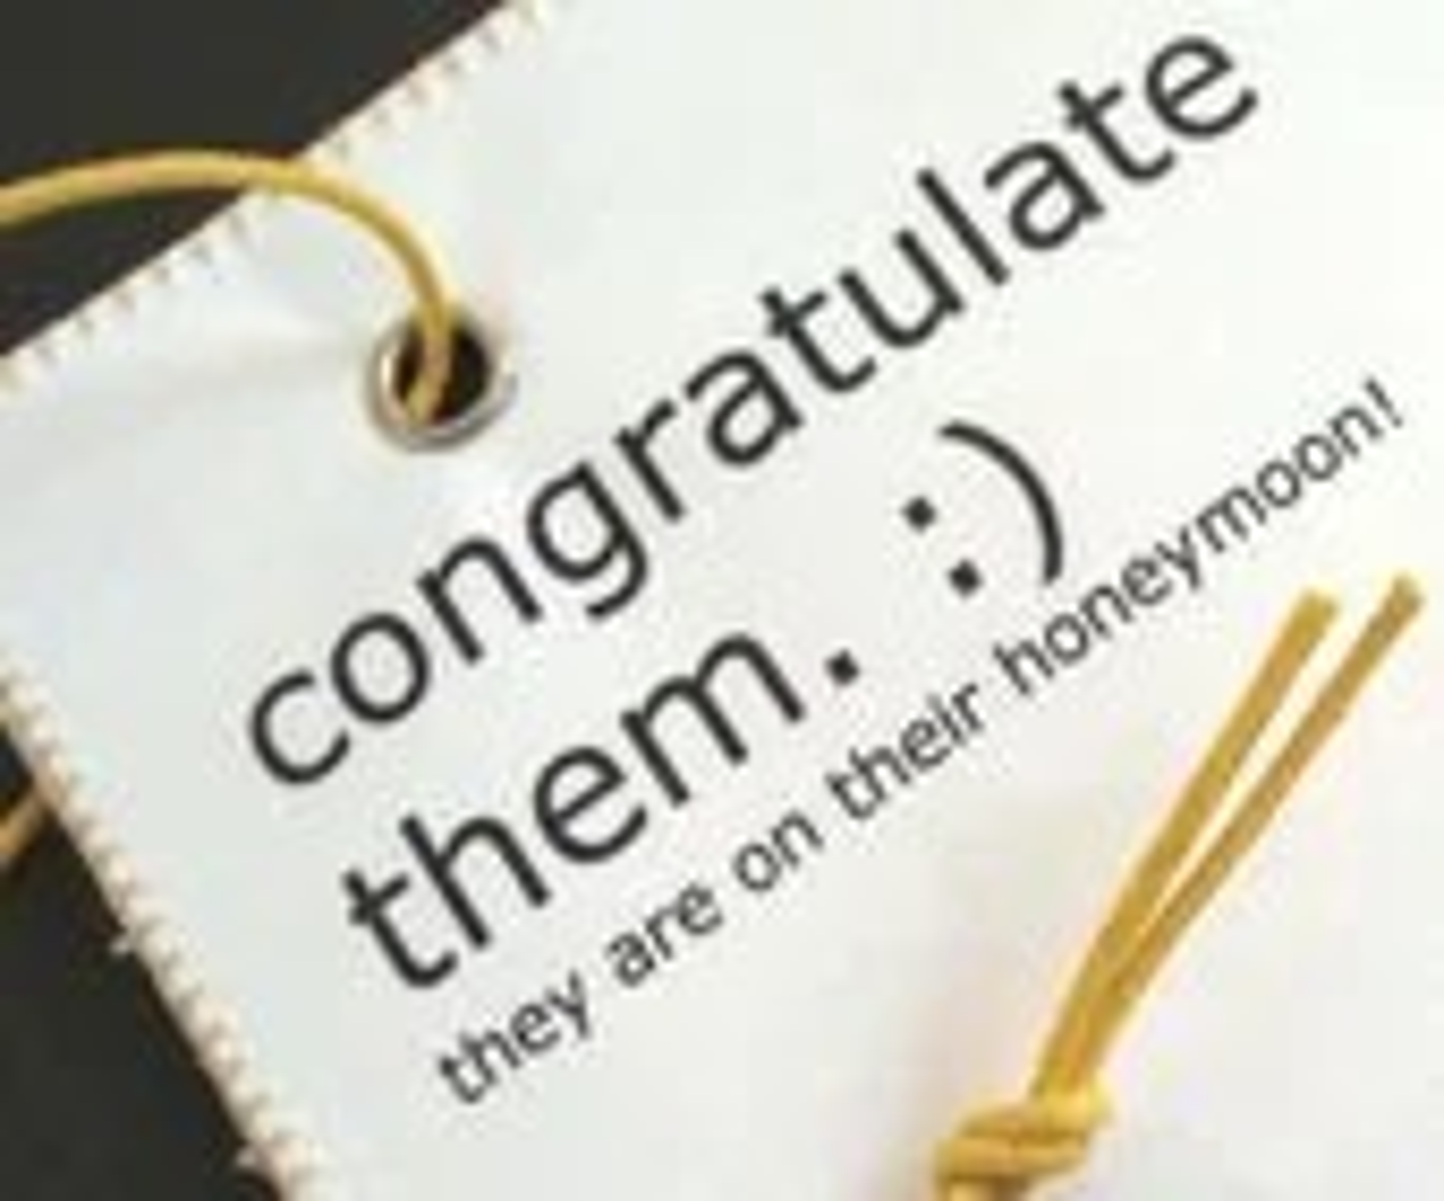 Unique Wedding Gift - Handmade Honeymoon luggage tag. Humorous Wedding Bridal Shower Gift - CestSuperbe